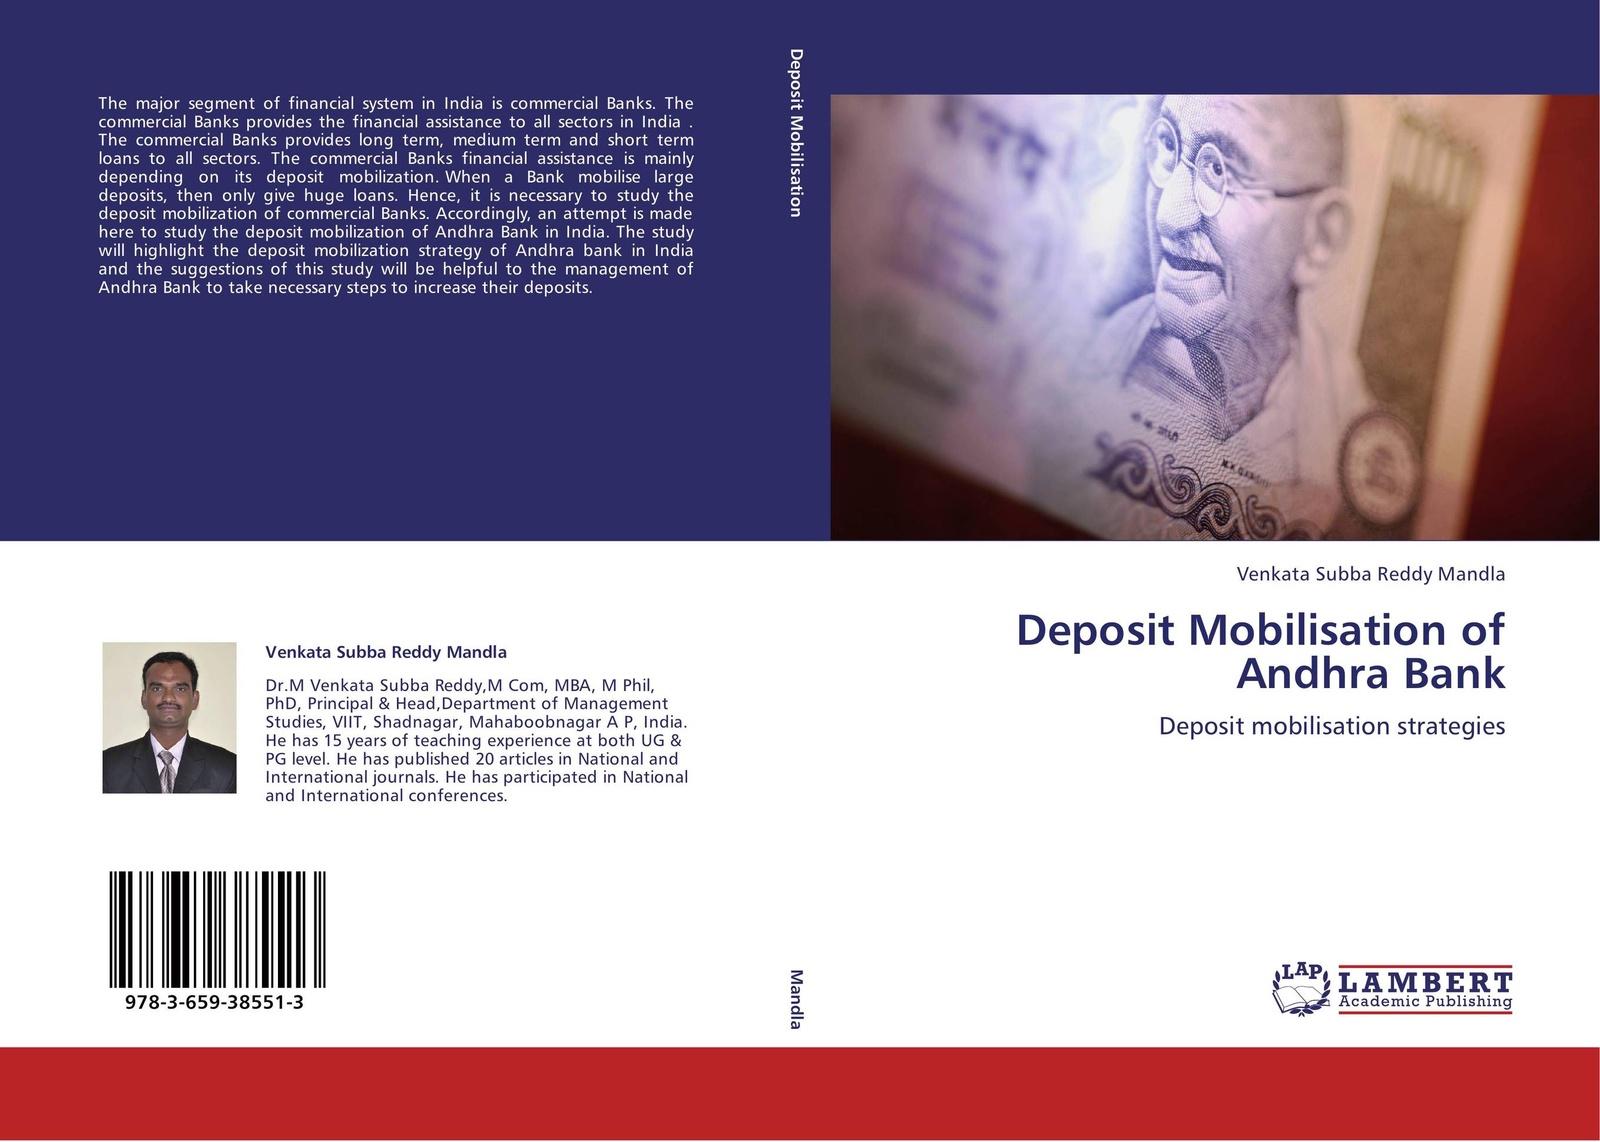 Venkata Subba Reddy Mandla Deposit Mobilisation of Andhra Bank the effect of alm on commercial banks profitability